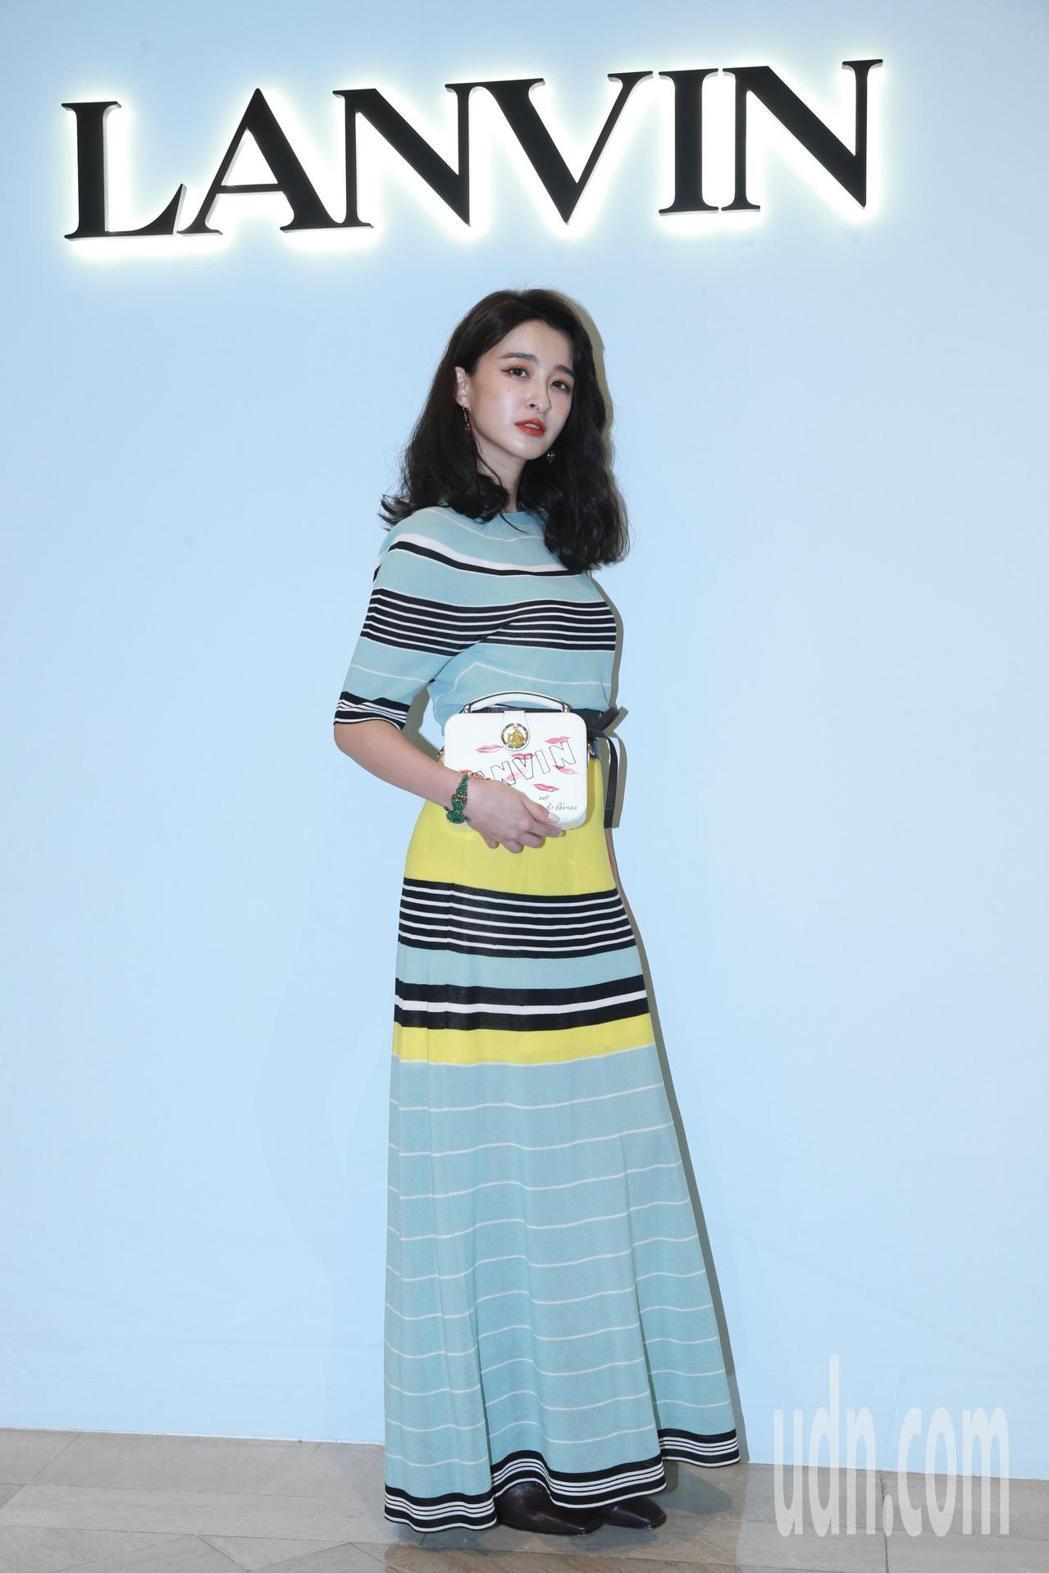 LANVIN台北信義新天地A9開設新櫃位,邀請網紅薛妞妞站台代言。